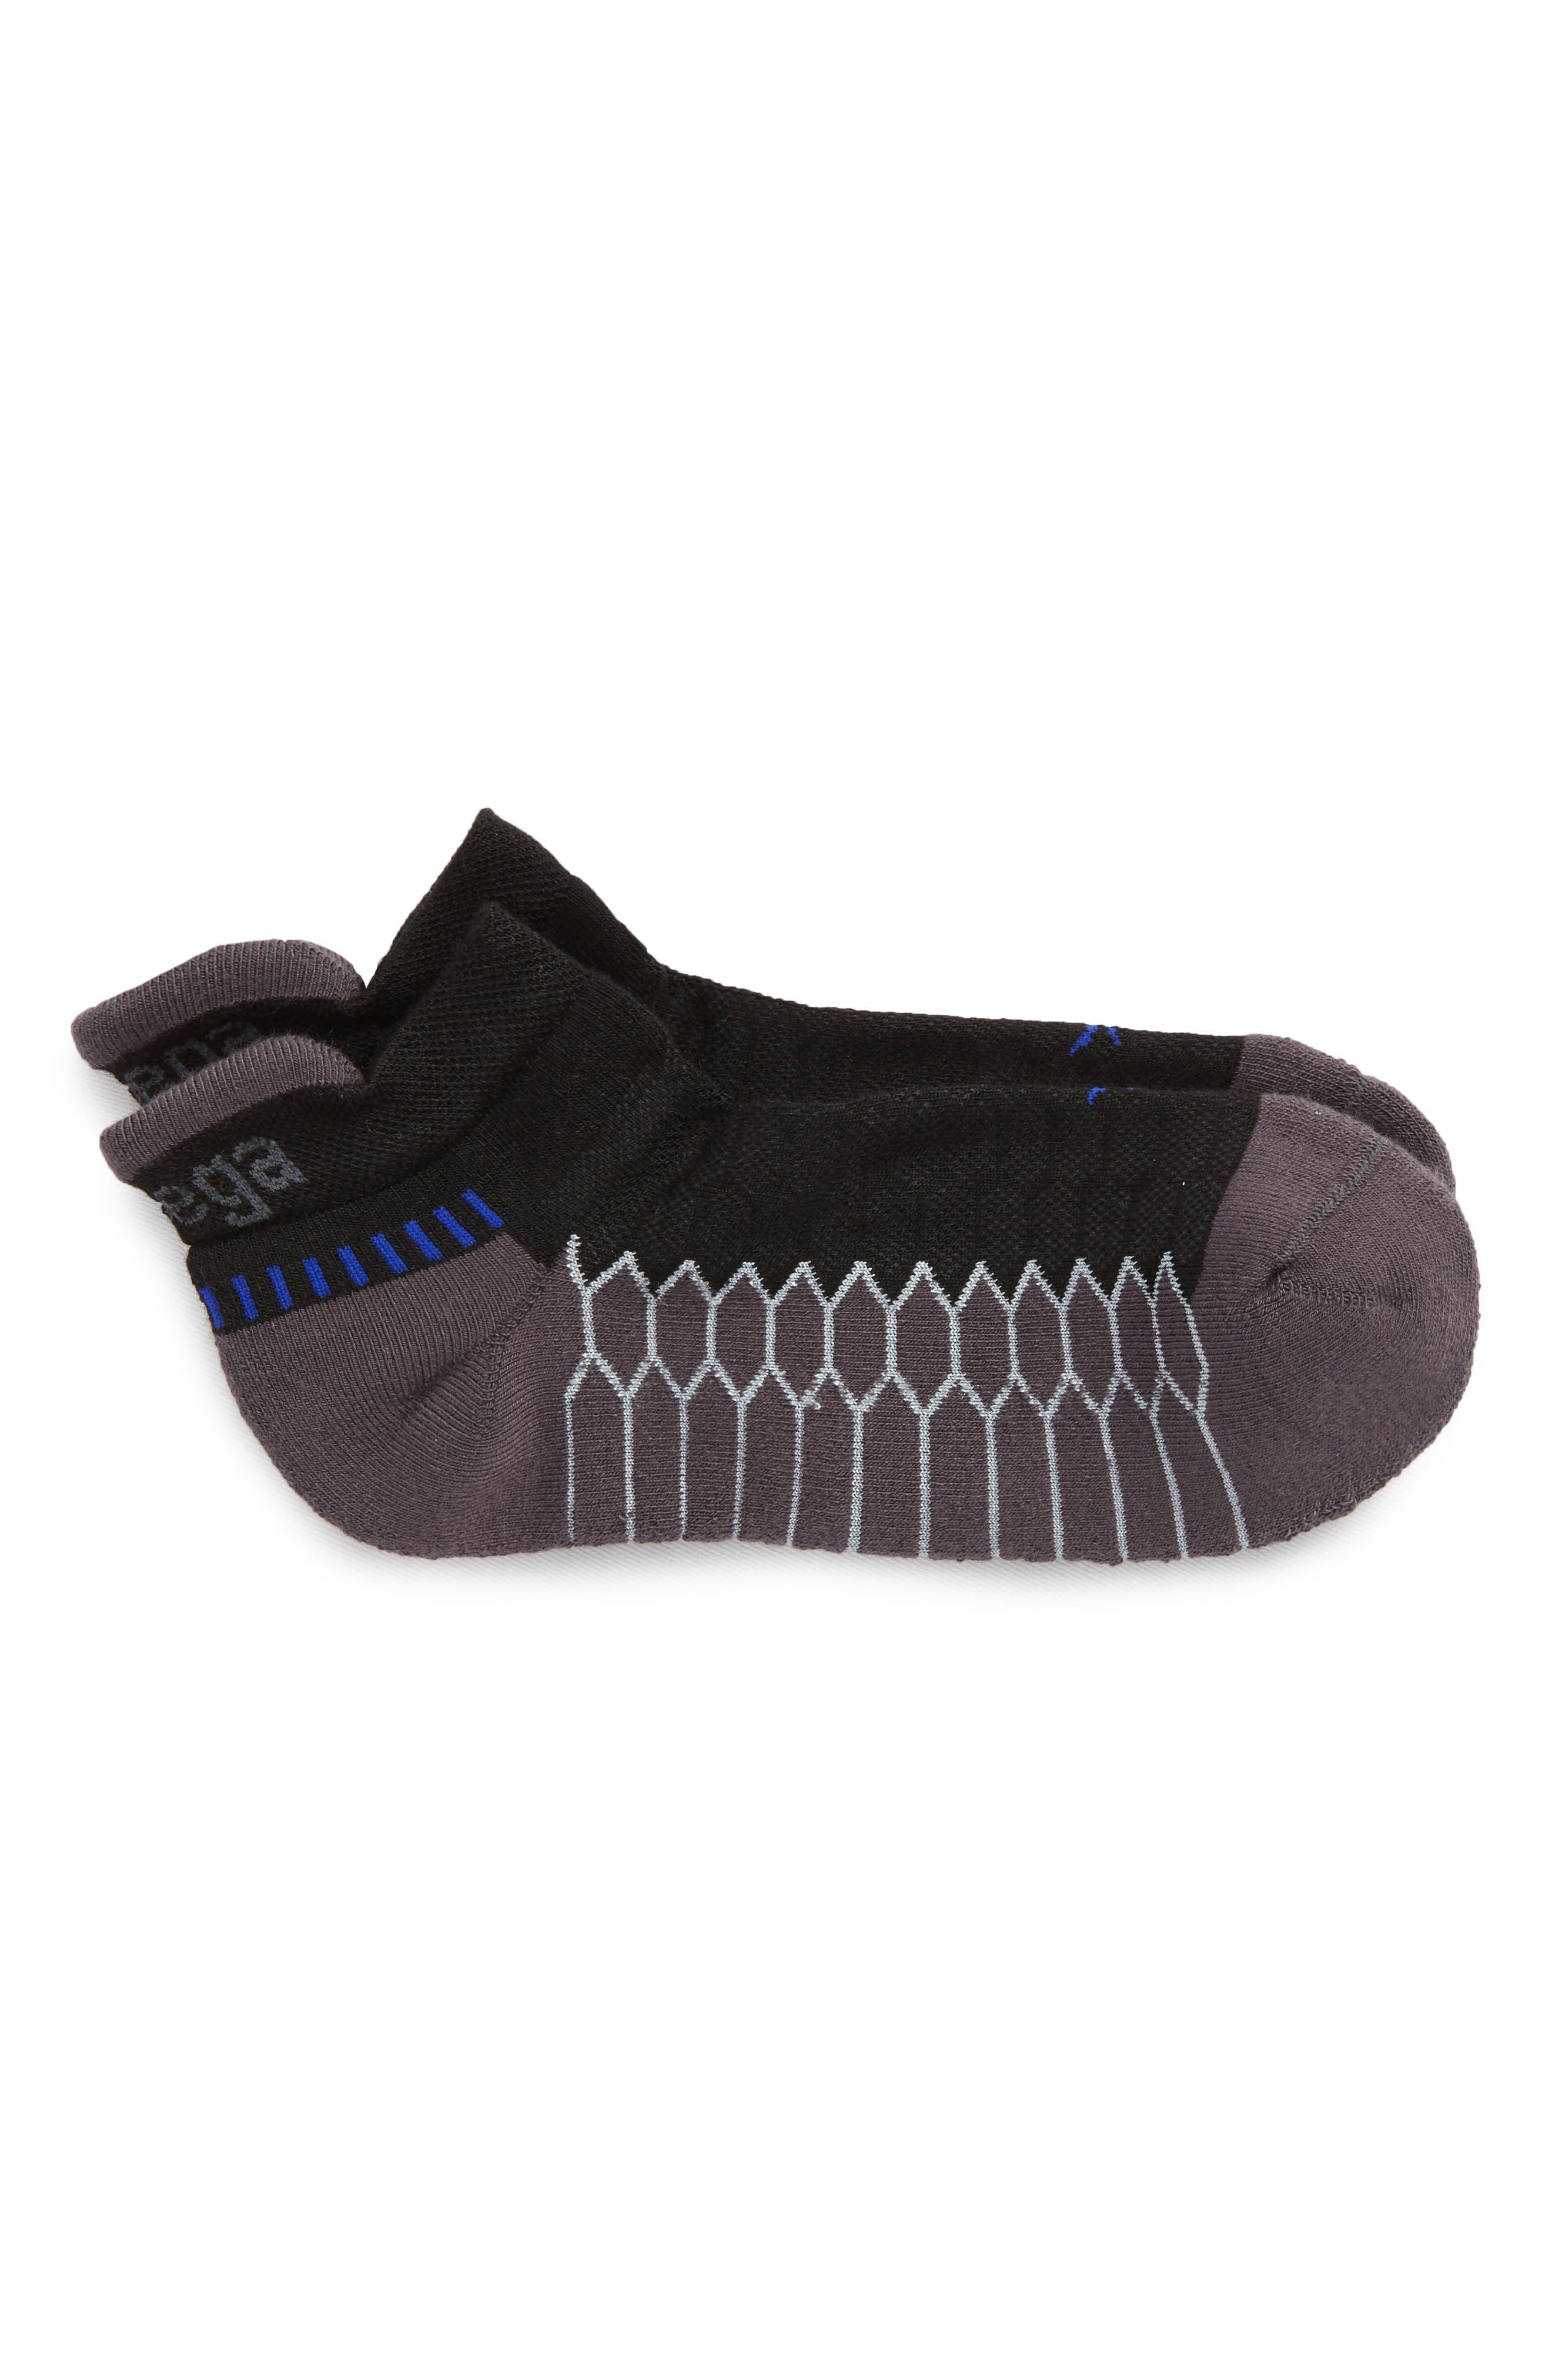 Silver Socks,                             Main thumbnail 1, color,                             Black/ Carbon